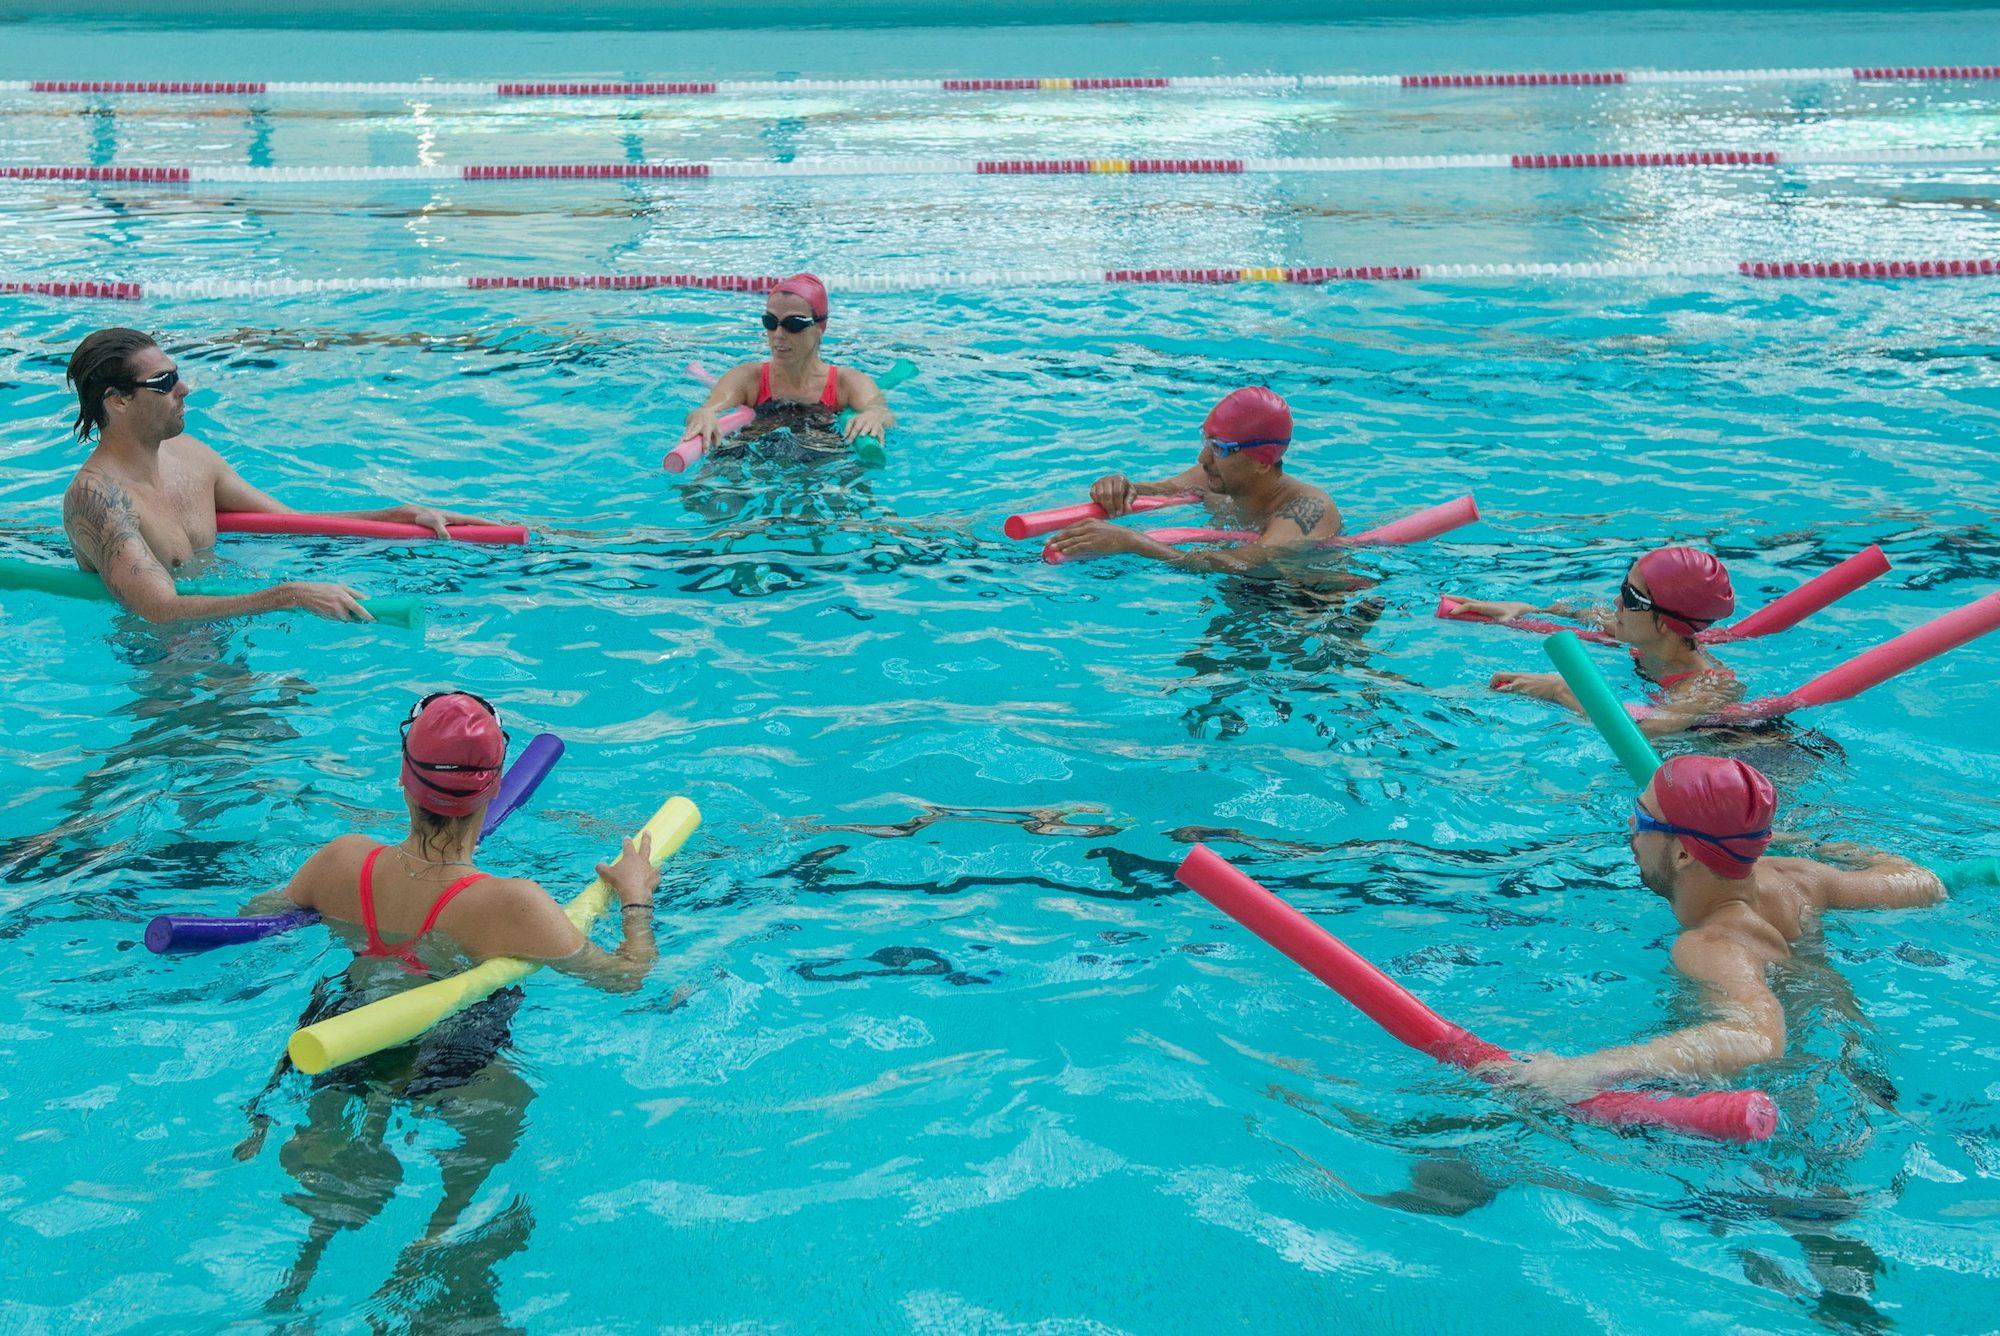 Speedo Futura Biofuse : enfin des lunettes de piscine confortables !